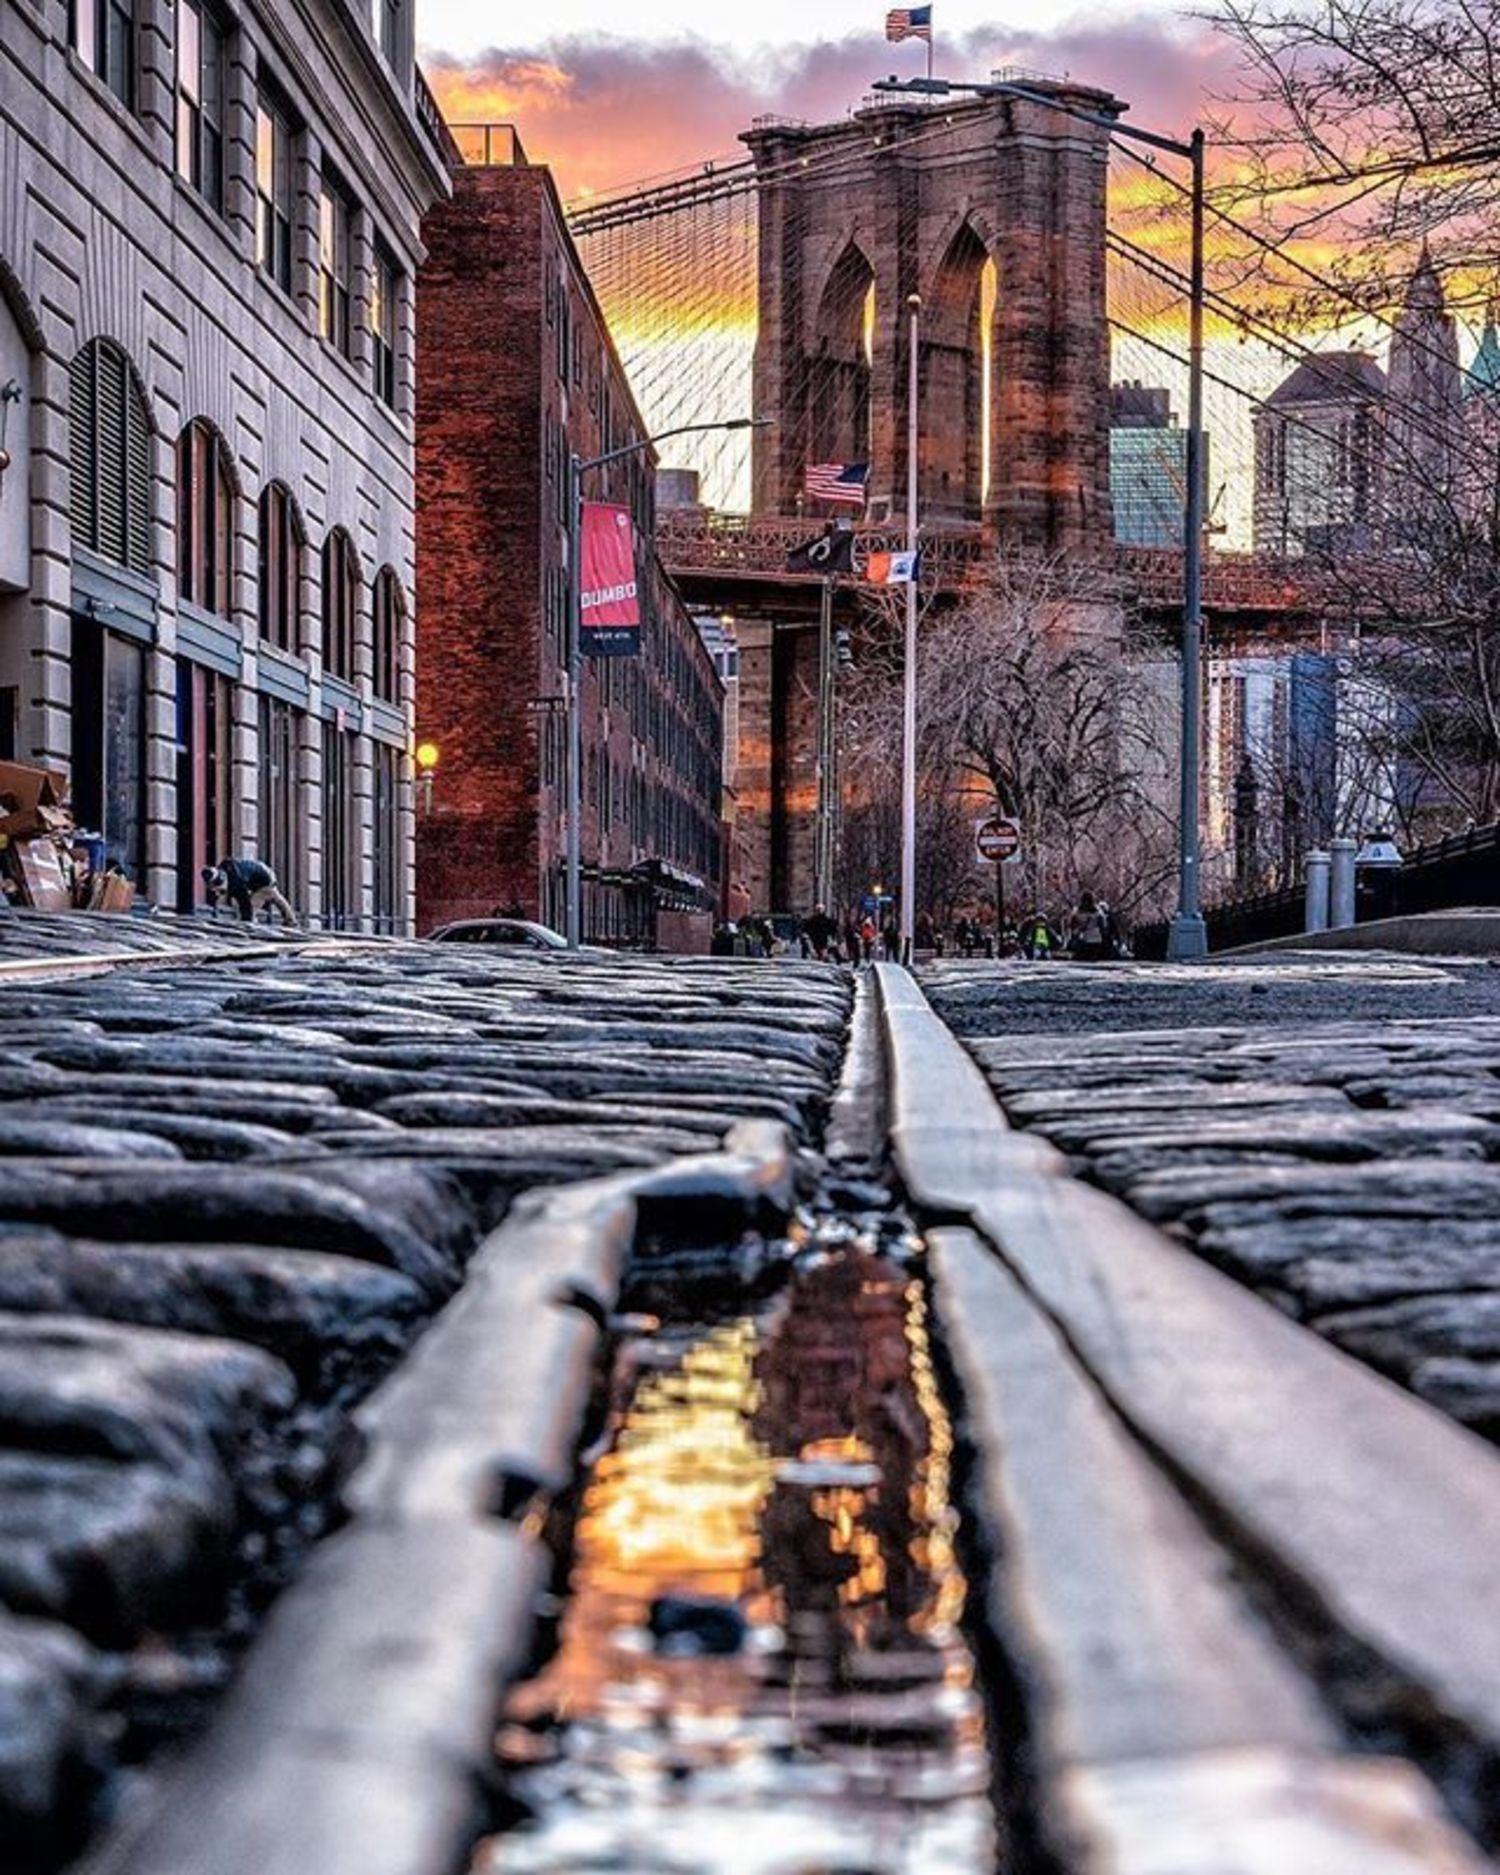 Dumbo, Brooklyn. Photo via @papakila #viewingnyc #newyork #newyorkcity #nyc #brooklynbridge #dumbo